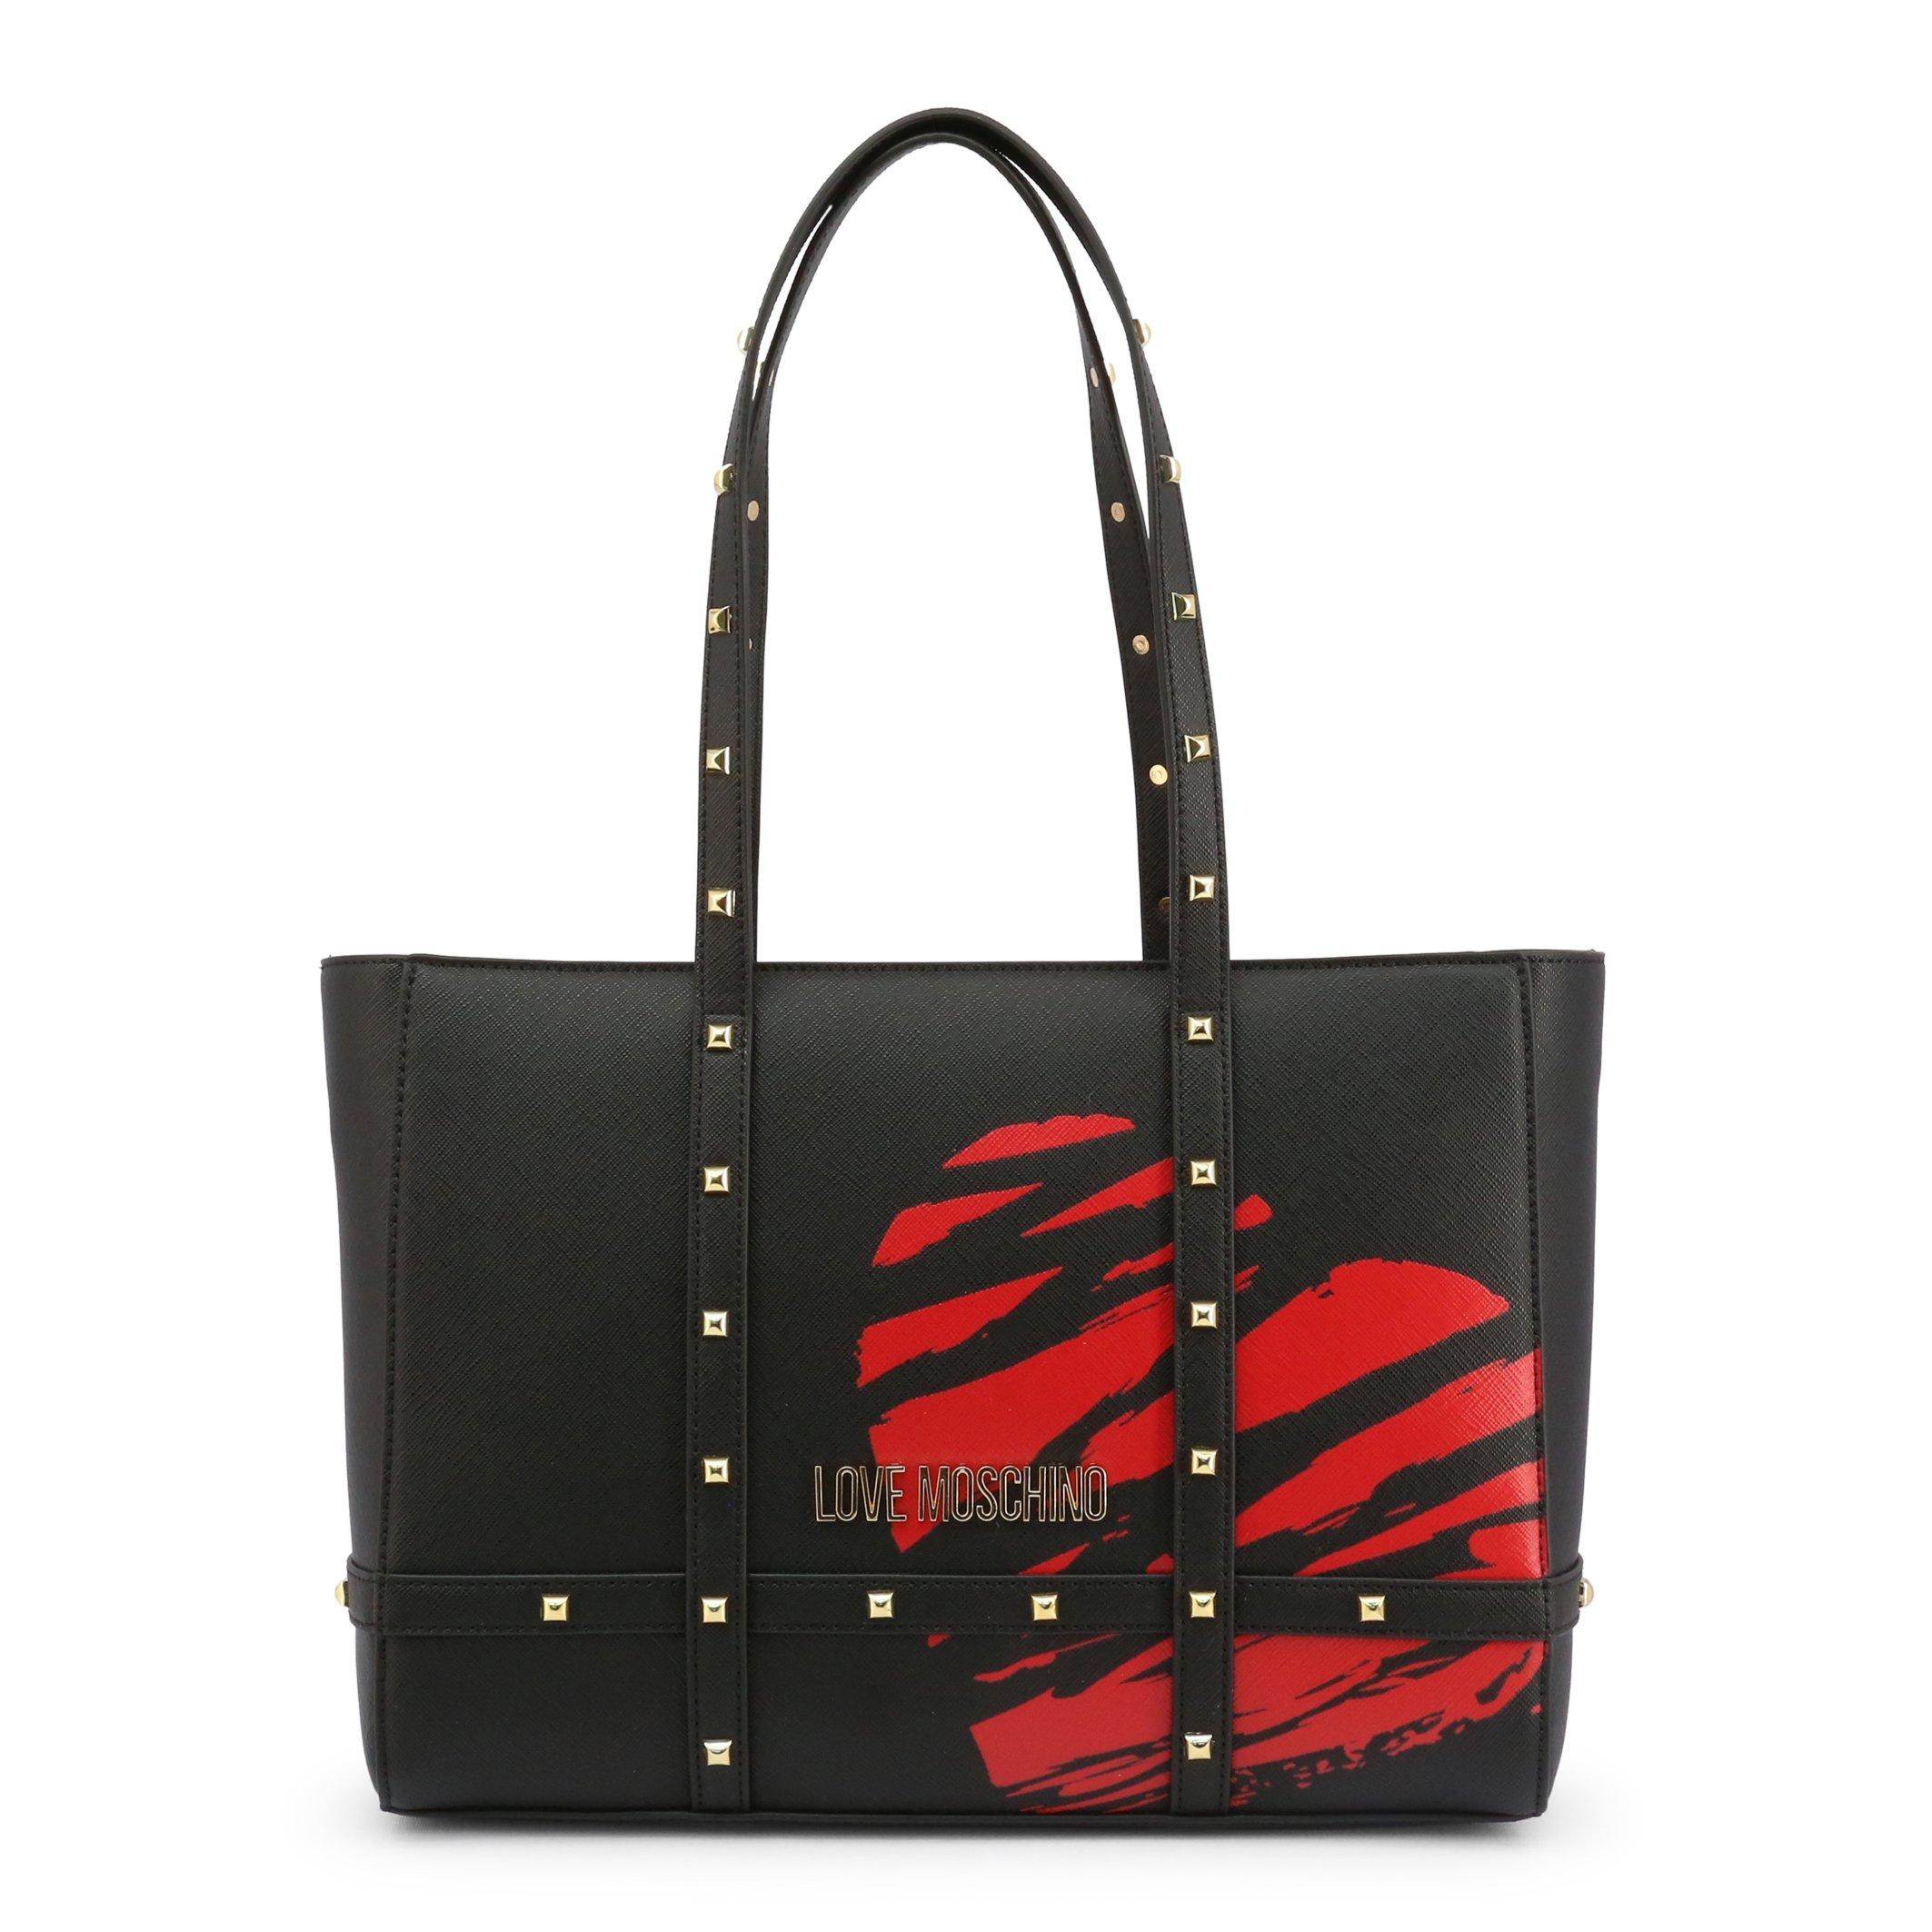 Love Moschino Women's Shoulder Bag Black JC4076PP1CLG1 - black-1 NOSIZE